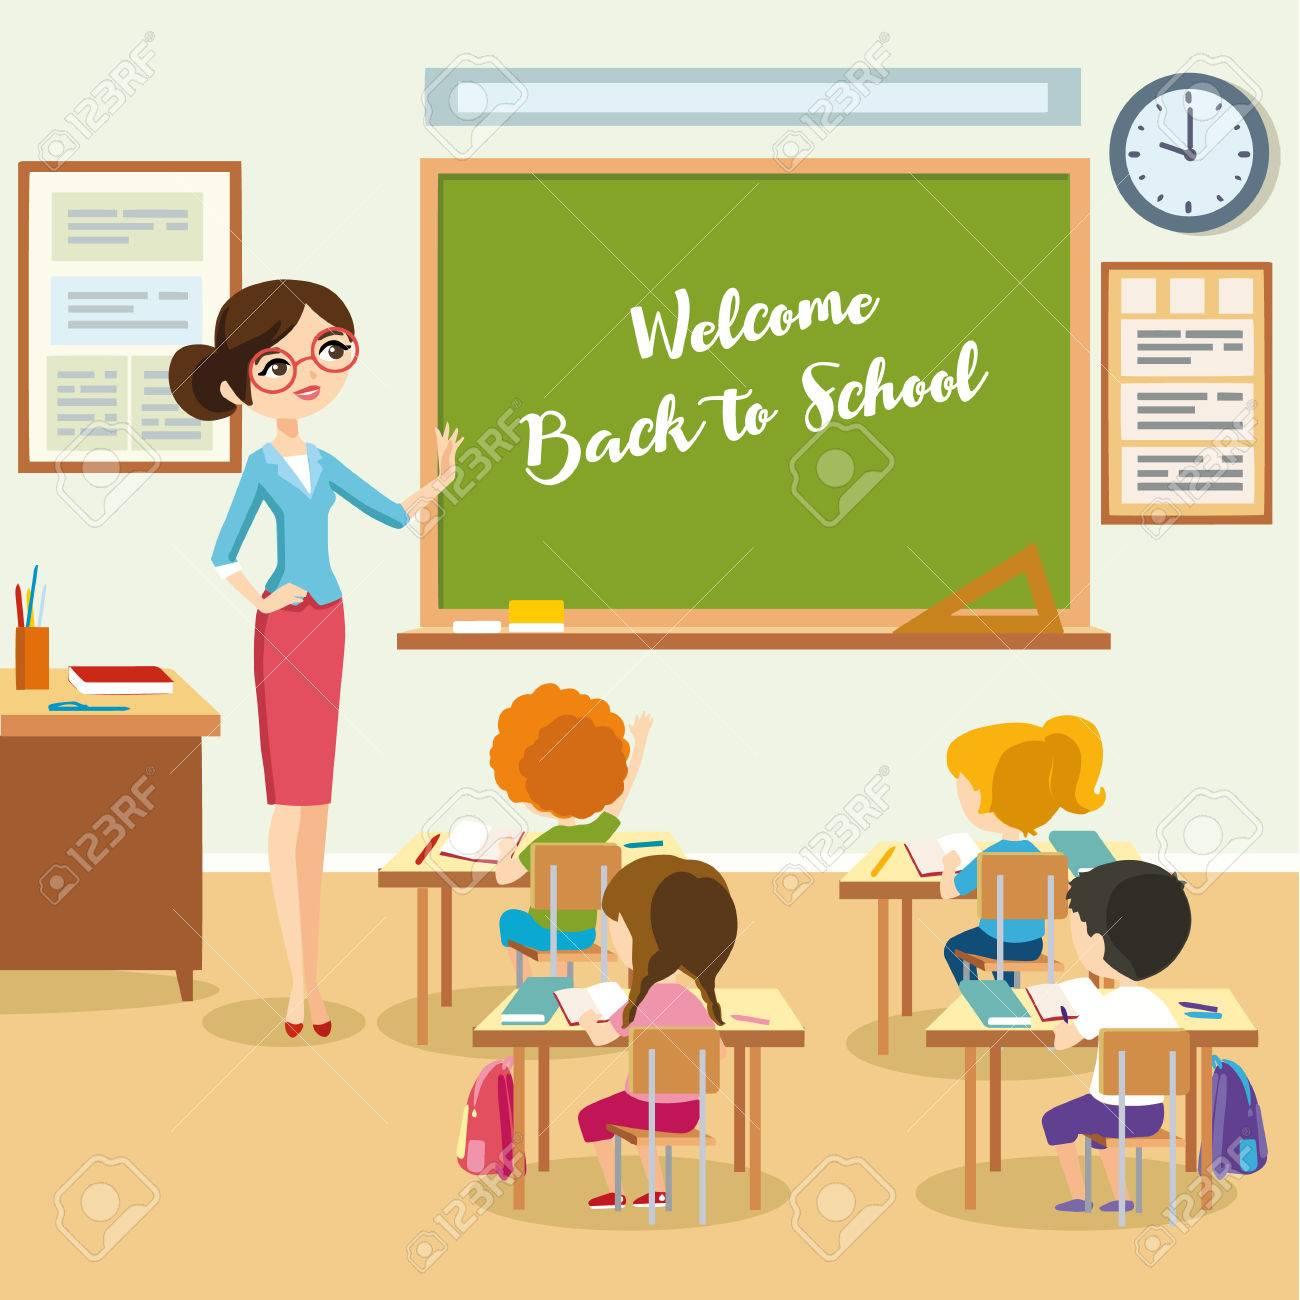 school lesson students listen teacher in the classroom children